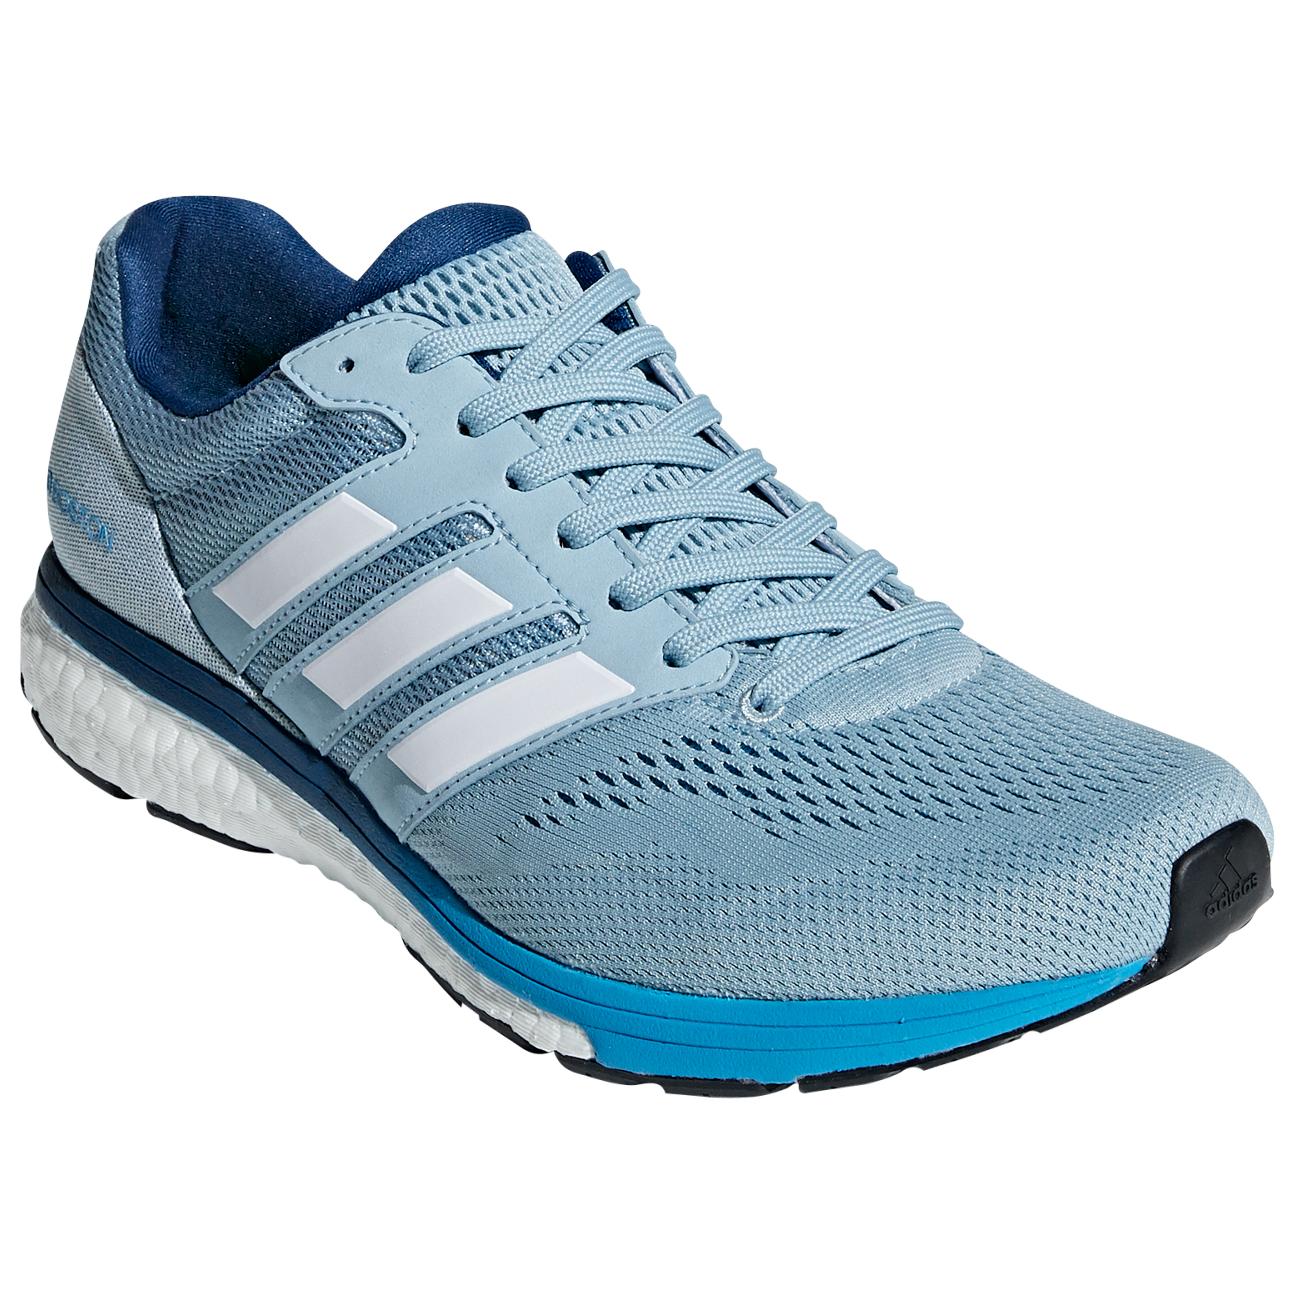 wholesale dealer 07125 7615b adidas - Adizero Boston 7 - Scarpe da corsa ...